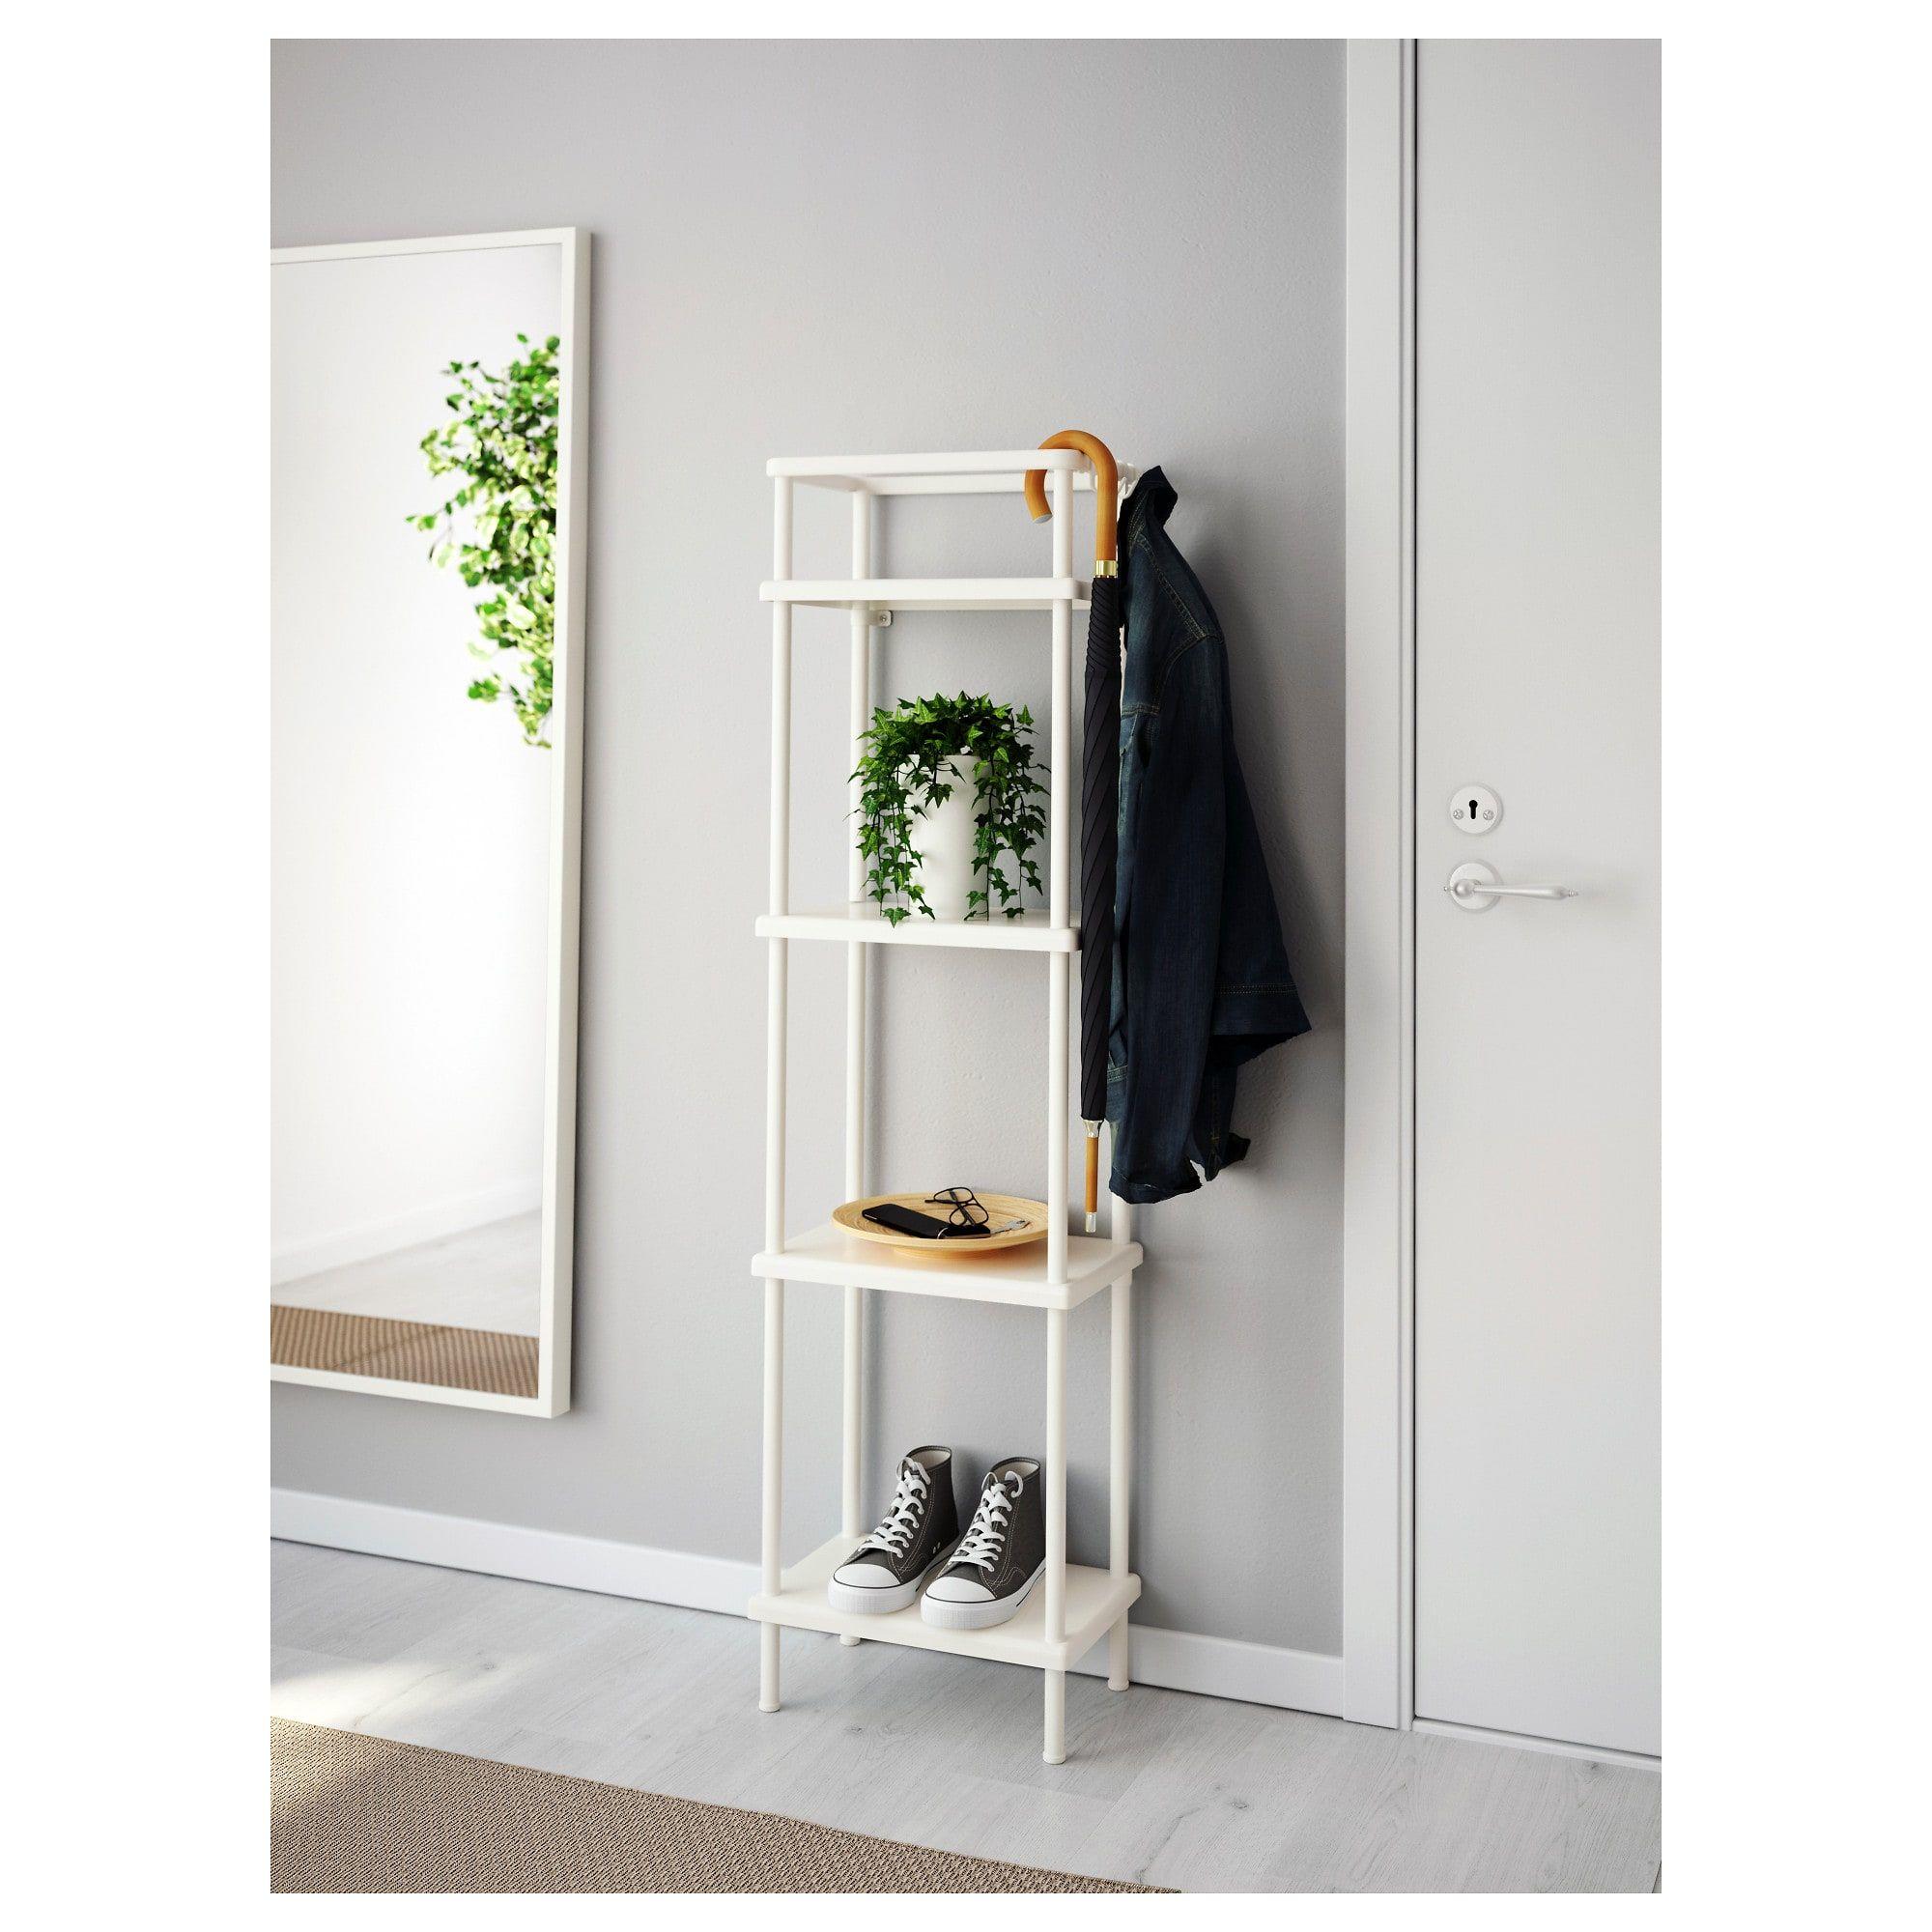 Dynan Shelf Unit White 15 3 4x10 5 8x58 1 4 Ikea Shelves Ikea Shelf Unit